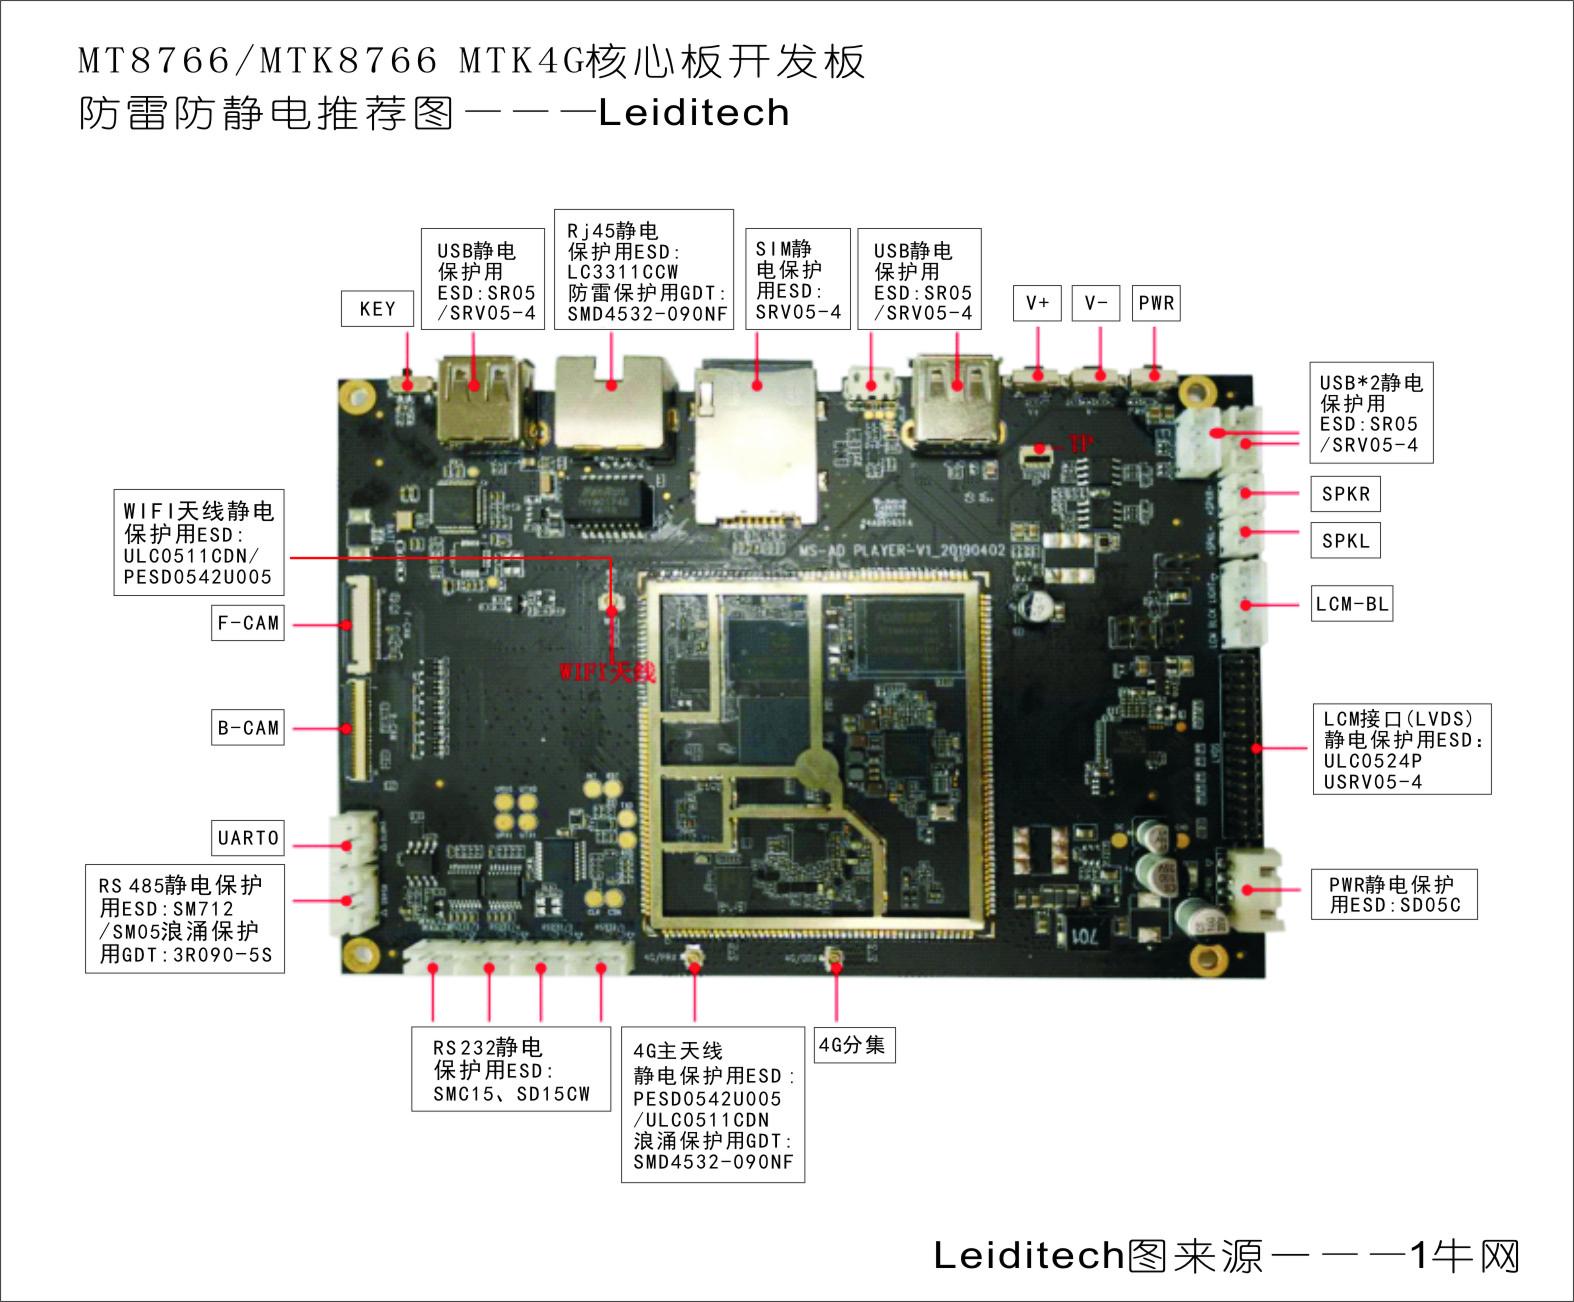 MT8766-mtk8766 mtk4G板开发板.jpg